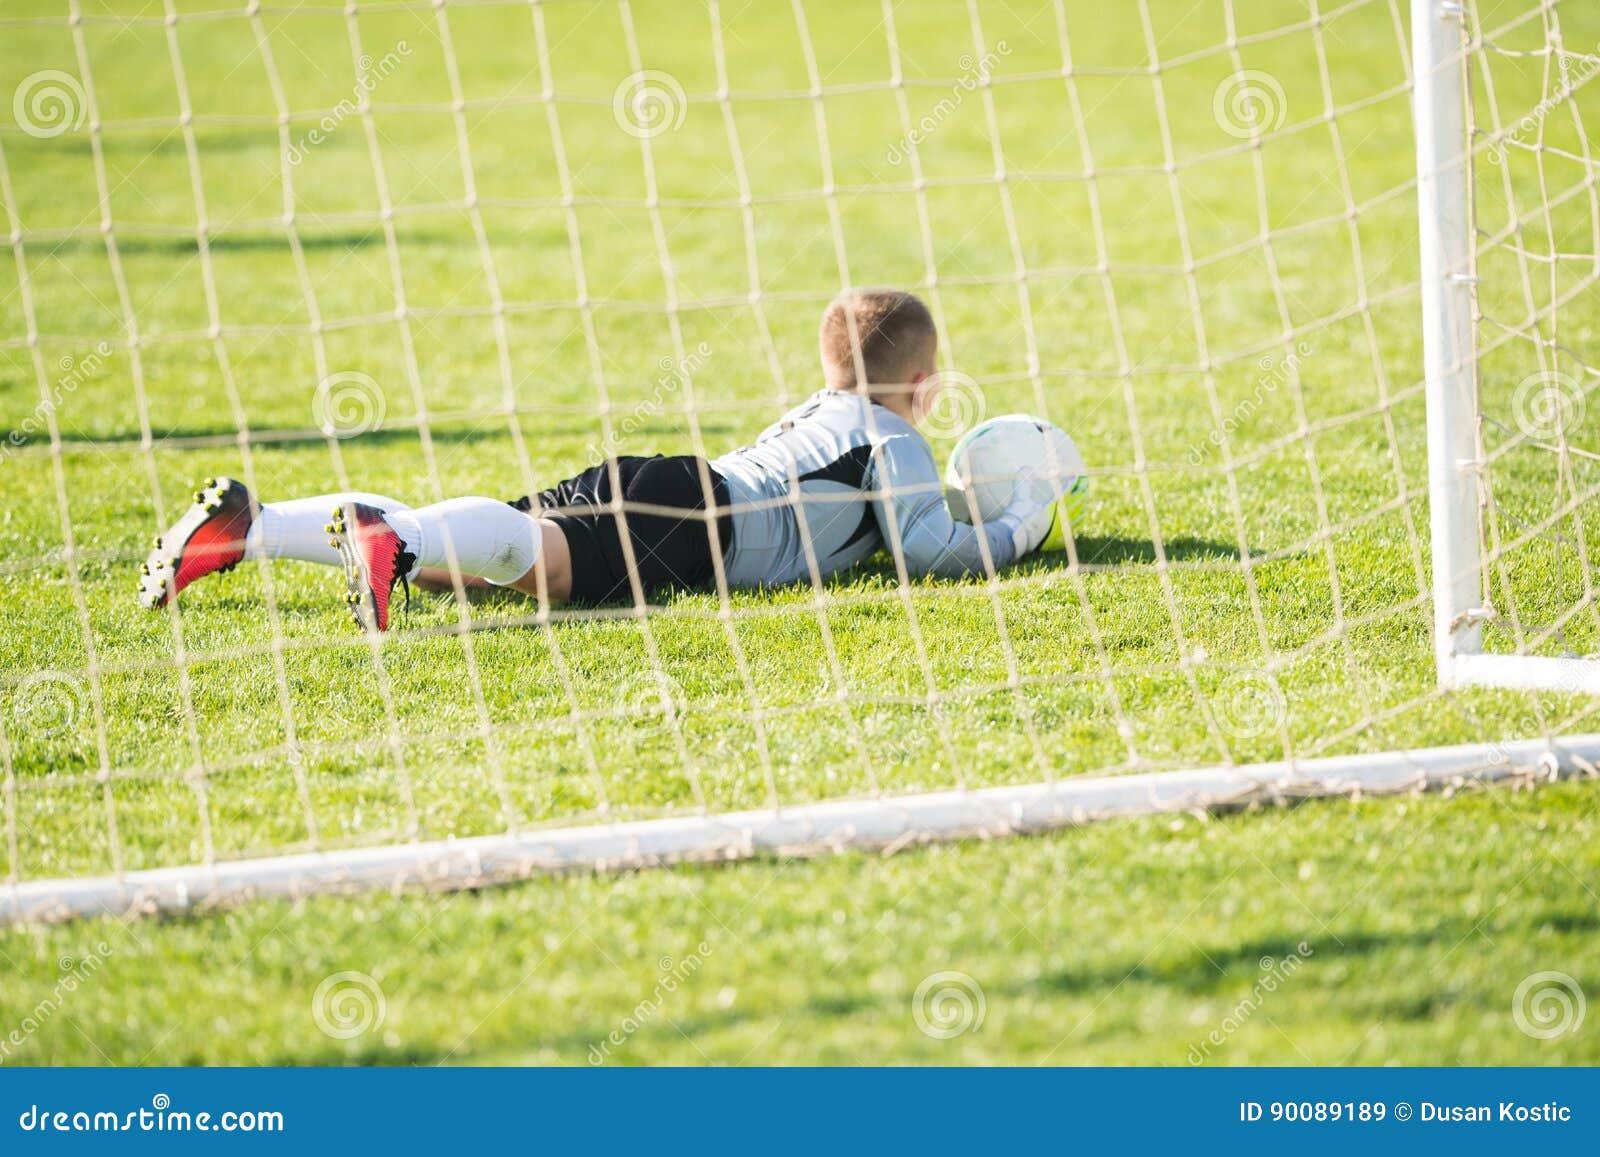 Kids soccer football - goal keeper on the match on soccer field